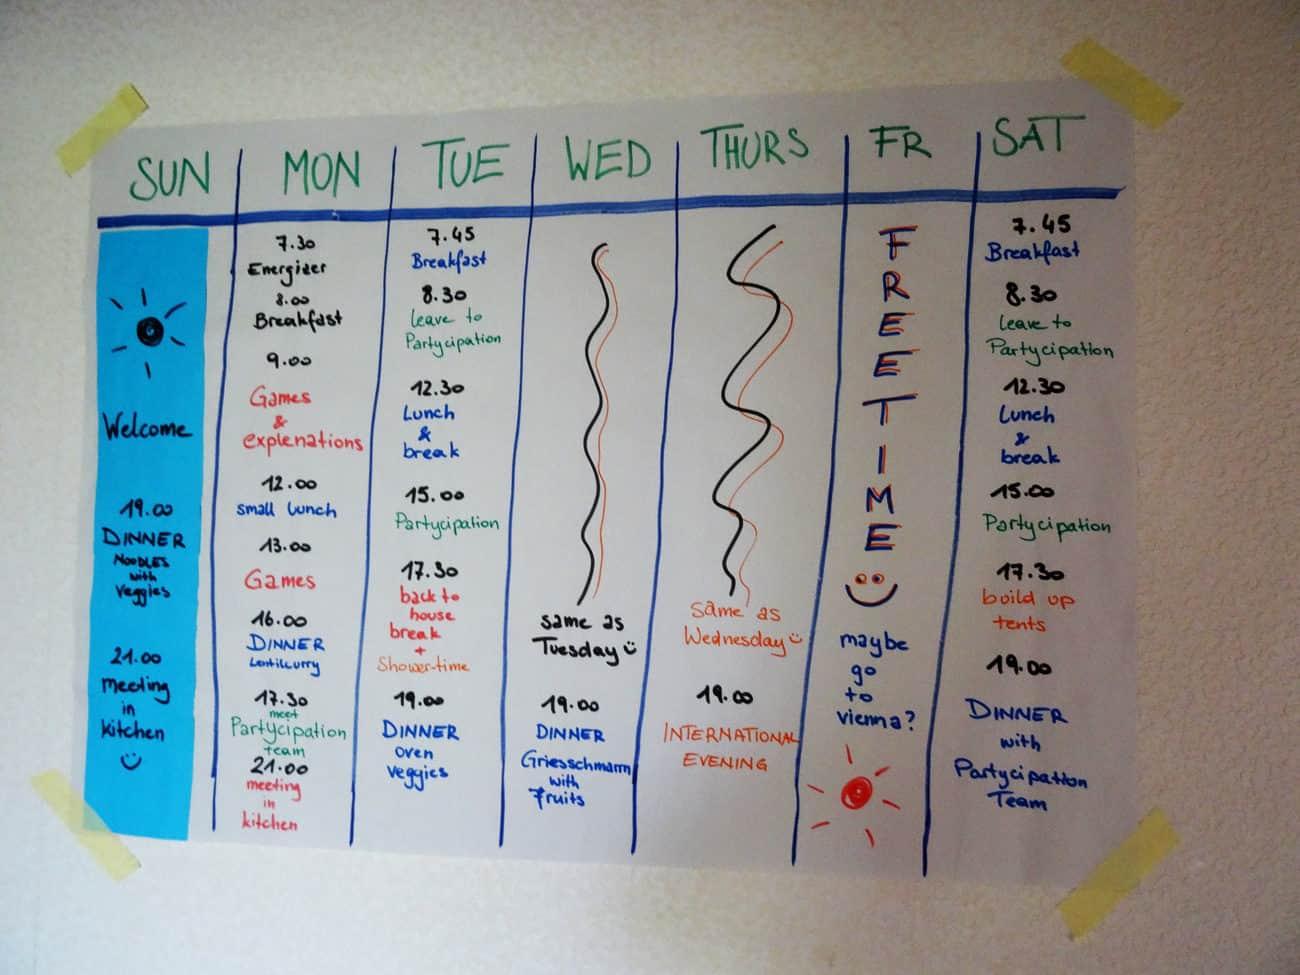 Workcamp Schedule, Leaders